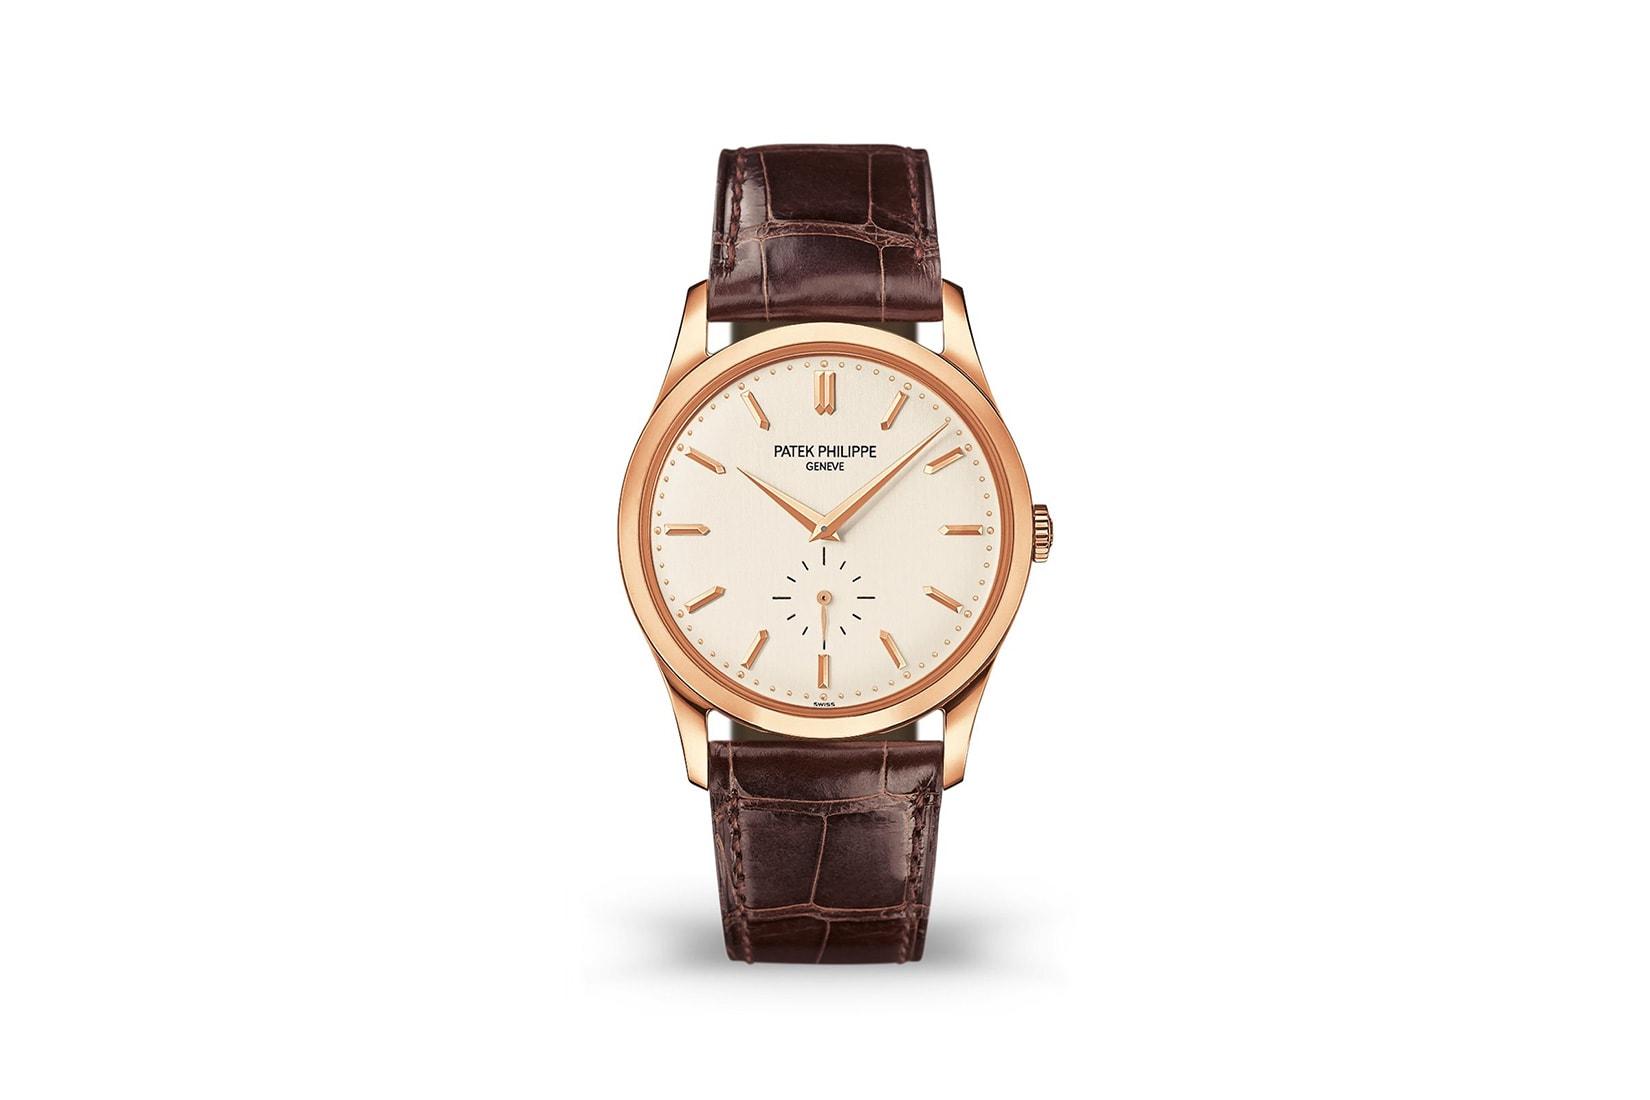 eBay luxury watch authenticity guarantee Patek Philippe Calatrava review - Luxe Digital